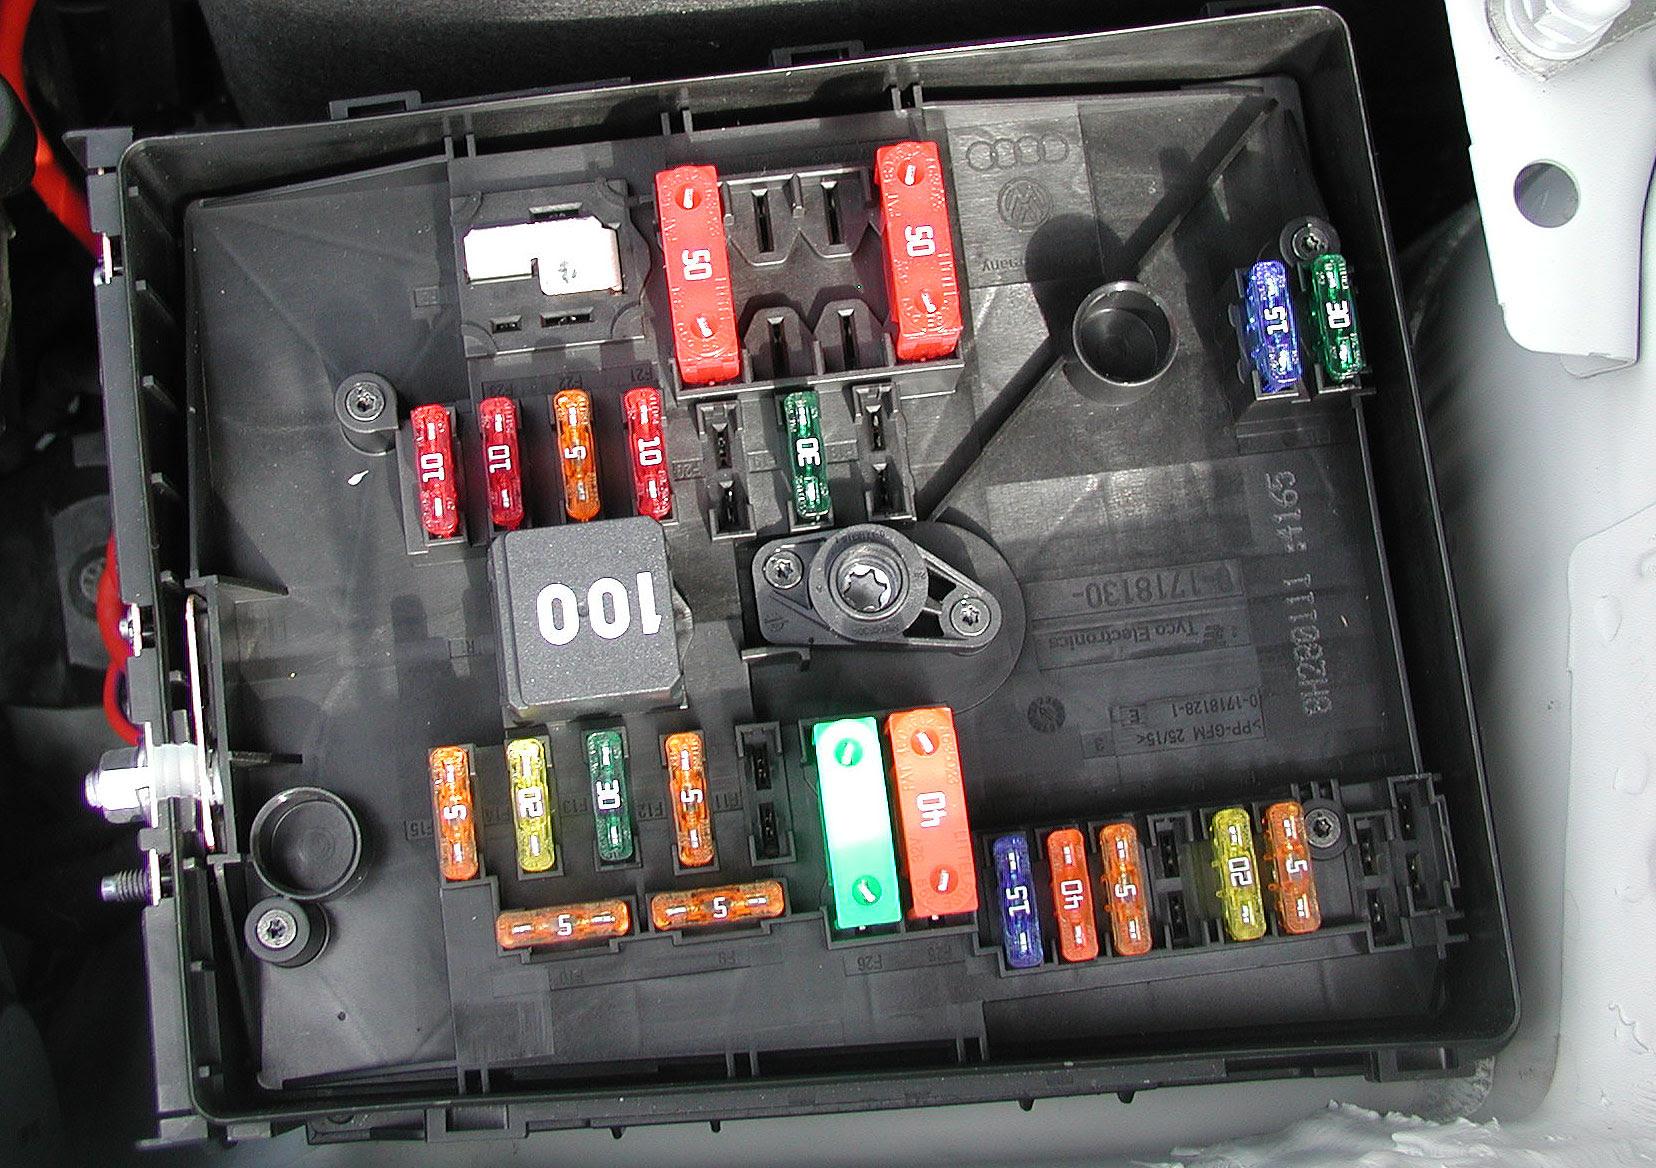 C4d00af 2011 Volkswagen Jetta 2 5 Engine Fuse Diagram Wiring Library